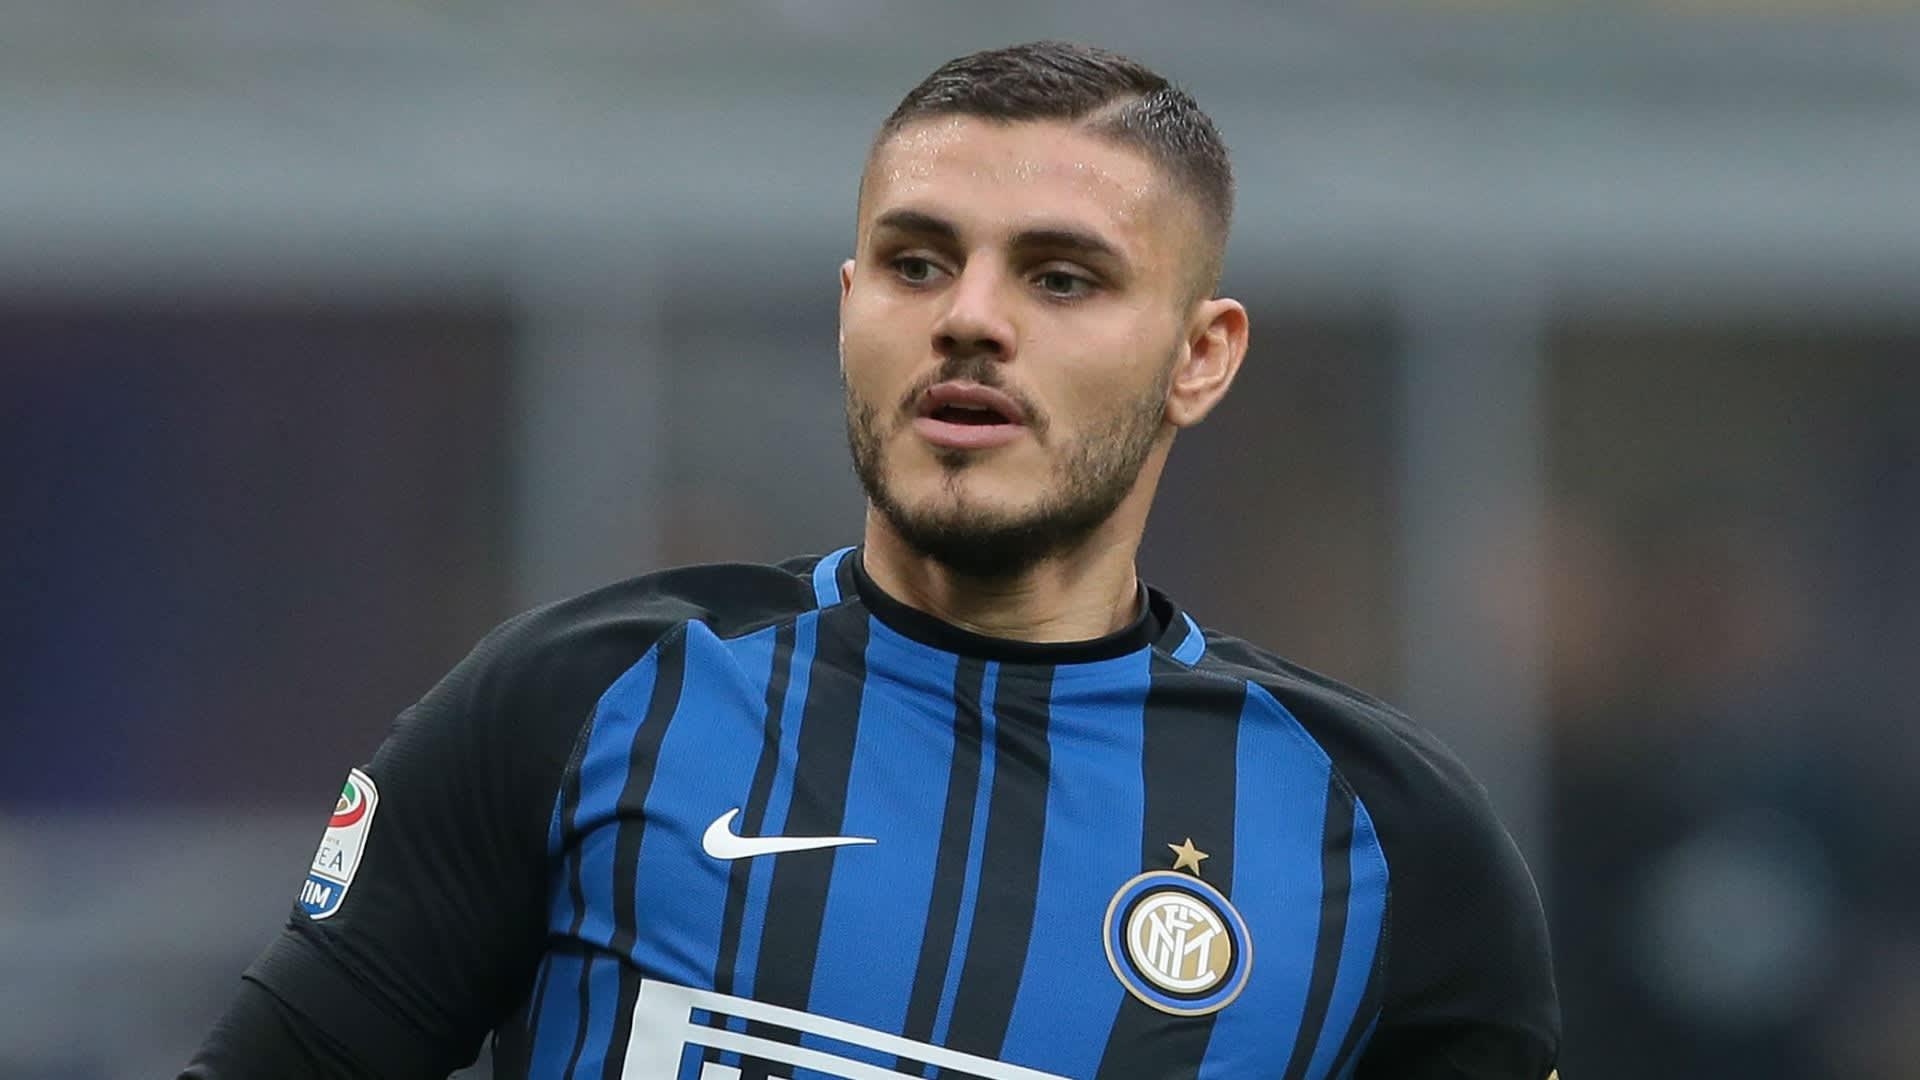 Mauro Icardi Argentina/Inter Milano